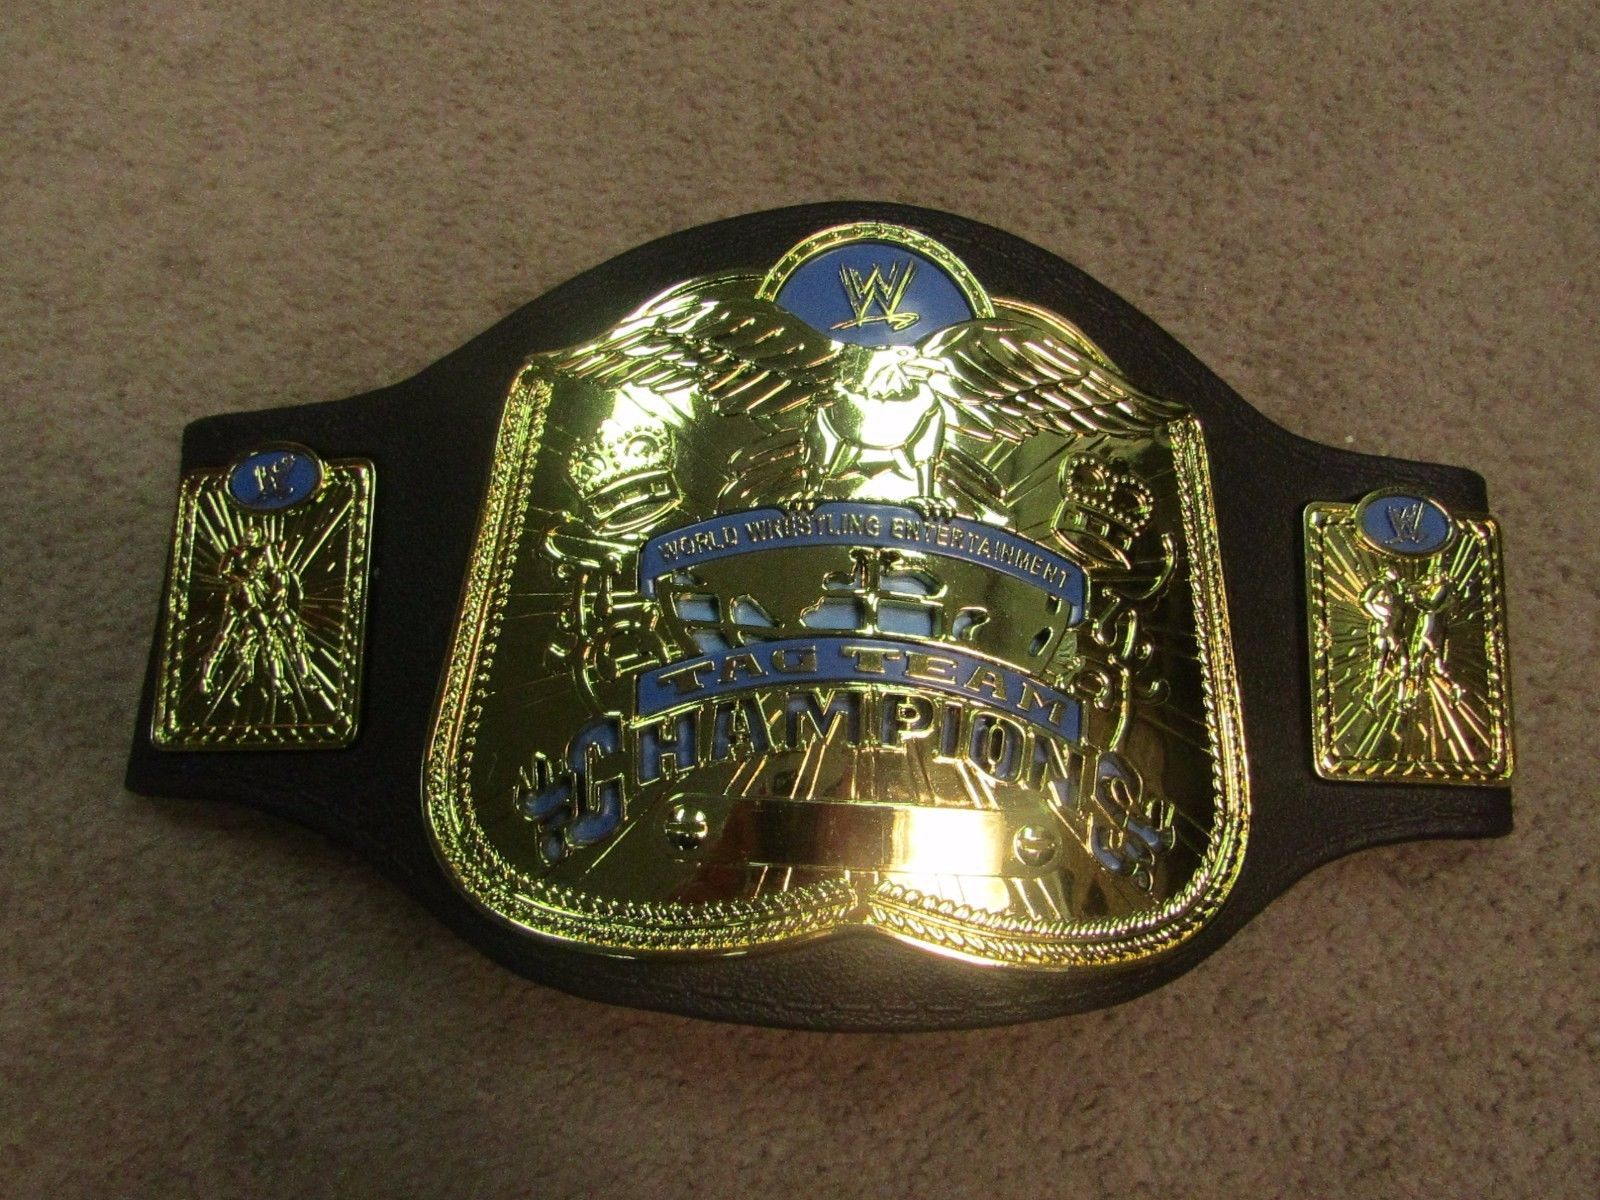 WWE WWF HBK Shawn Michaels Signed Mattel Belt autograph w// Video Proof JSA COA